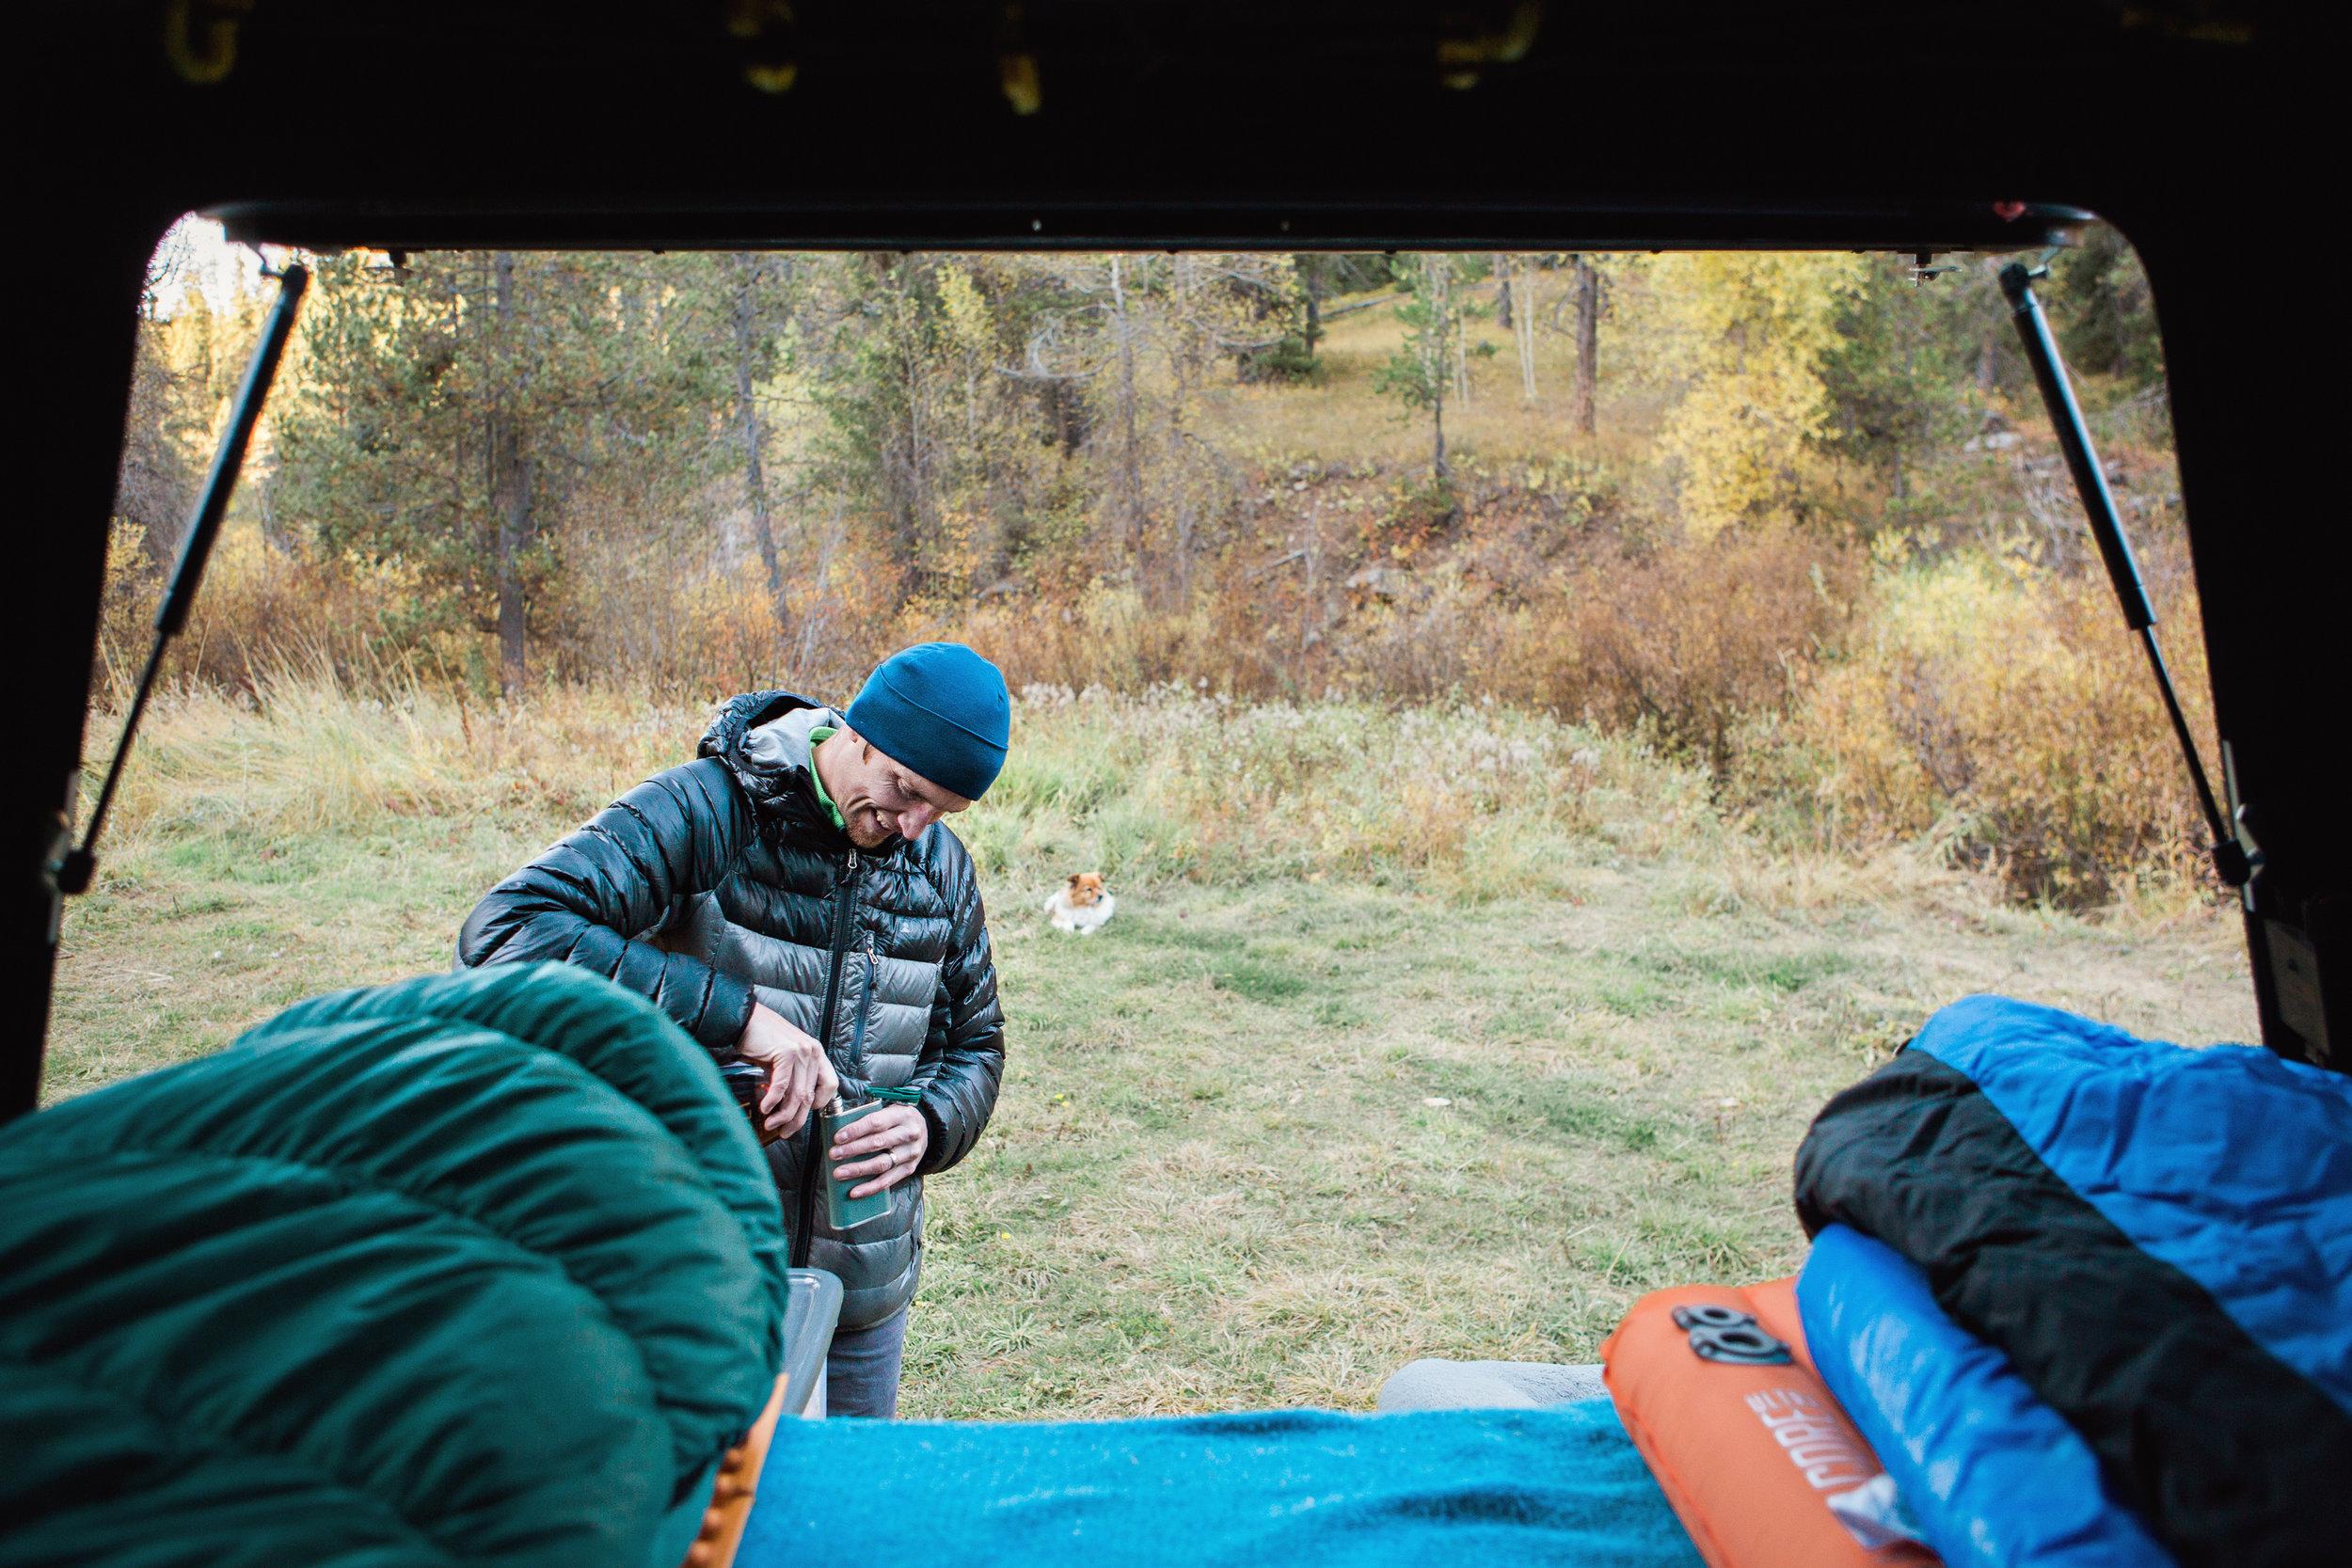 Cindy_Giovagnoli_Idaho_Wyoming_Grand_Teton_National_Park_autumn_aspens_camping_mountains-025.jpg